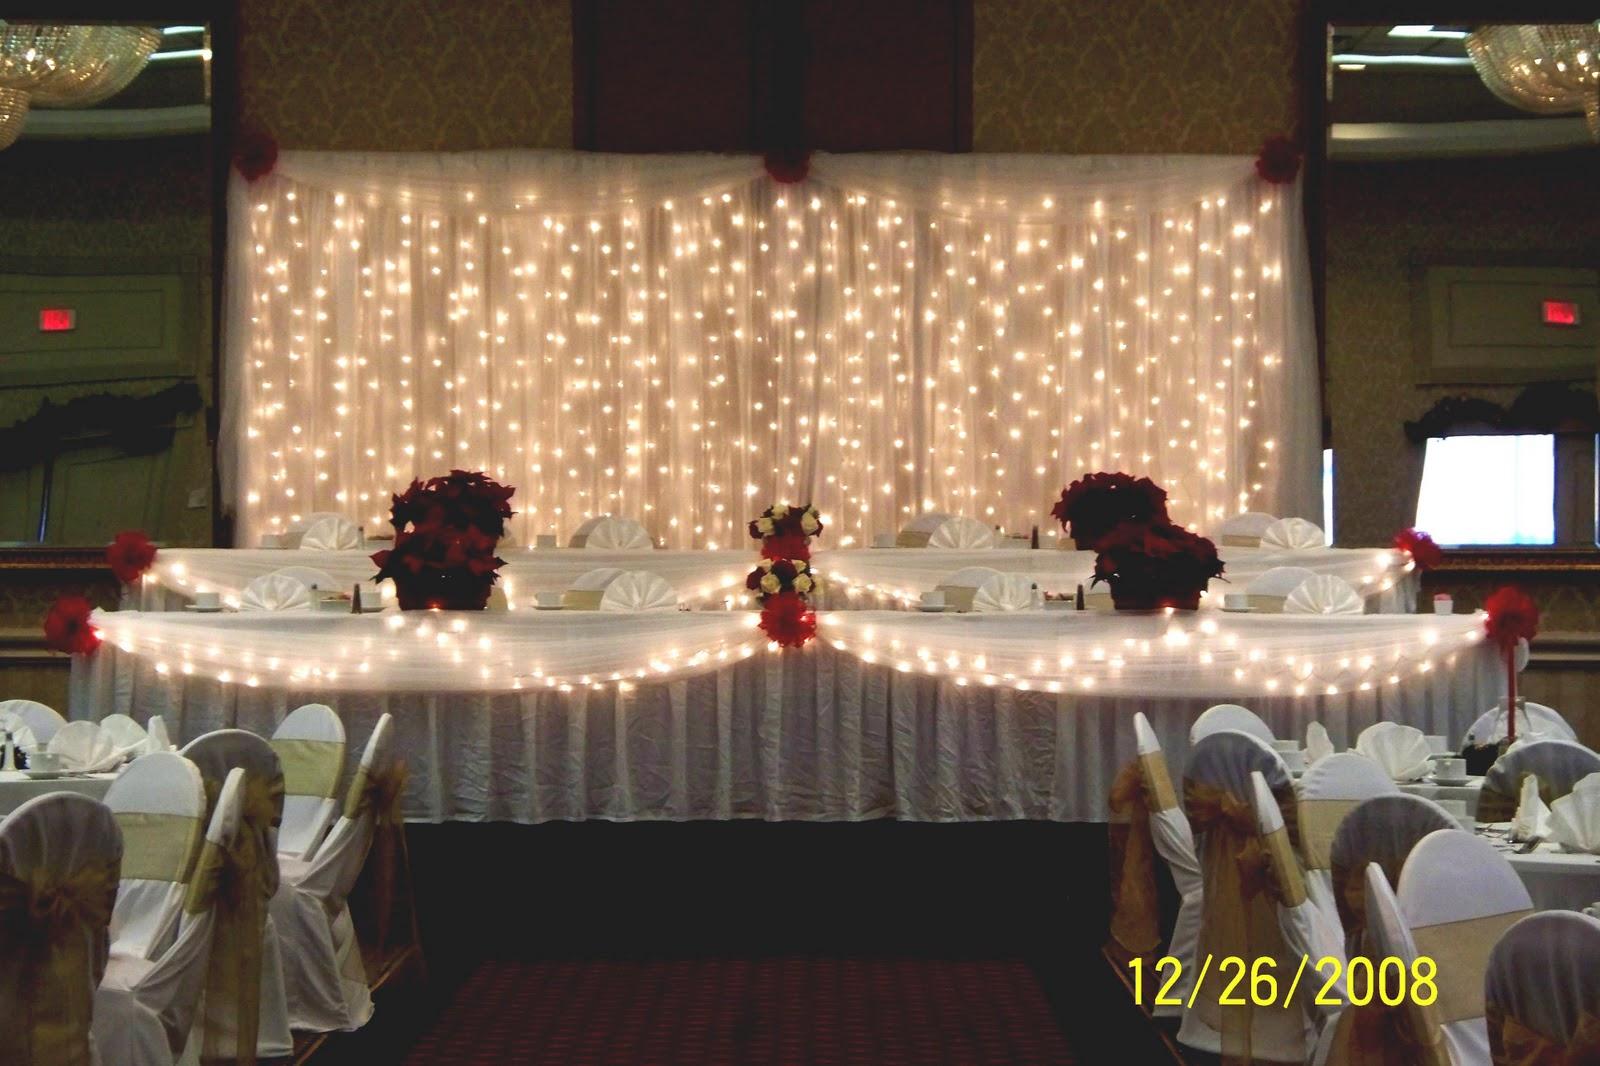 Bride And Groom Table Setting Emiliesbeauty Com